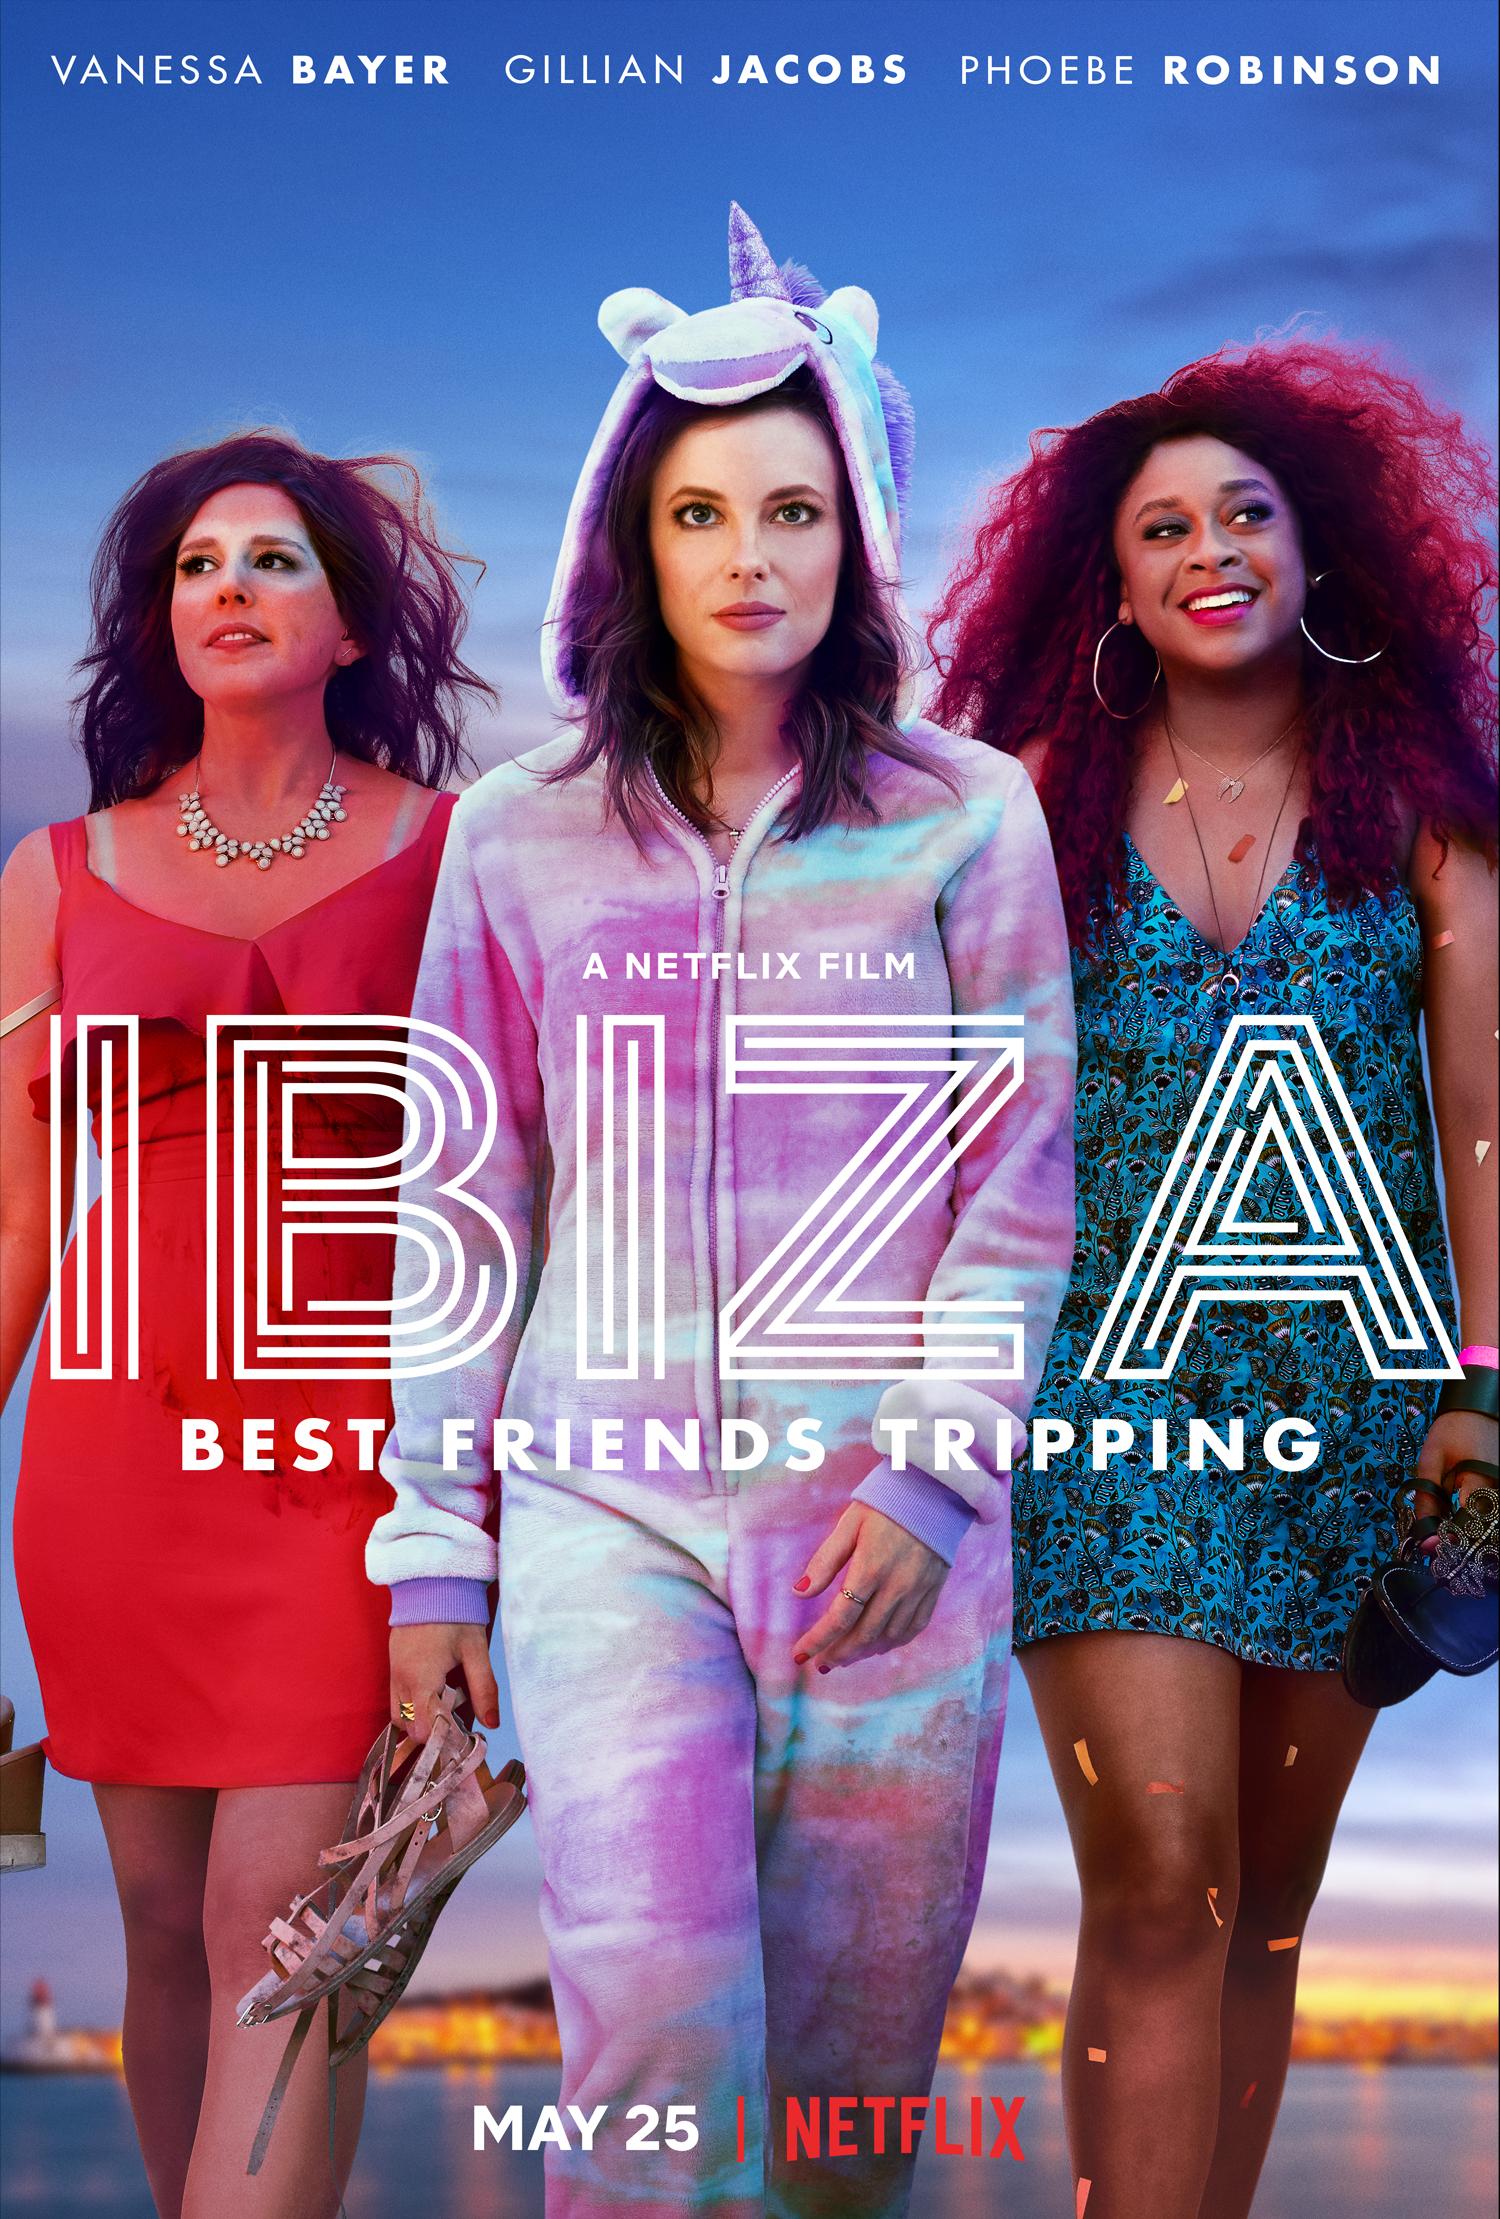 ibiza-deluxe-poster-netflix-original-film-mainrgb.jpg